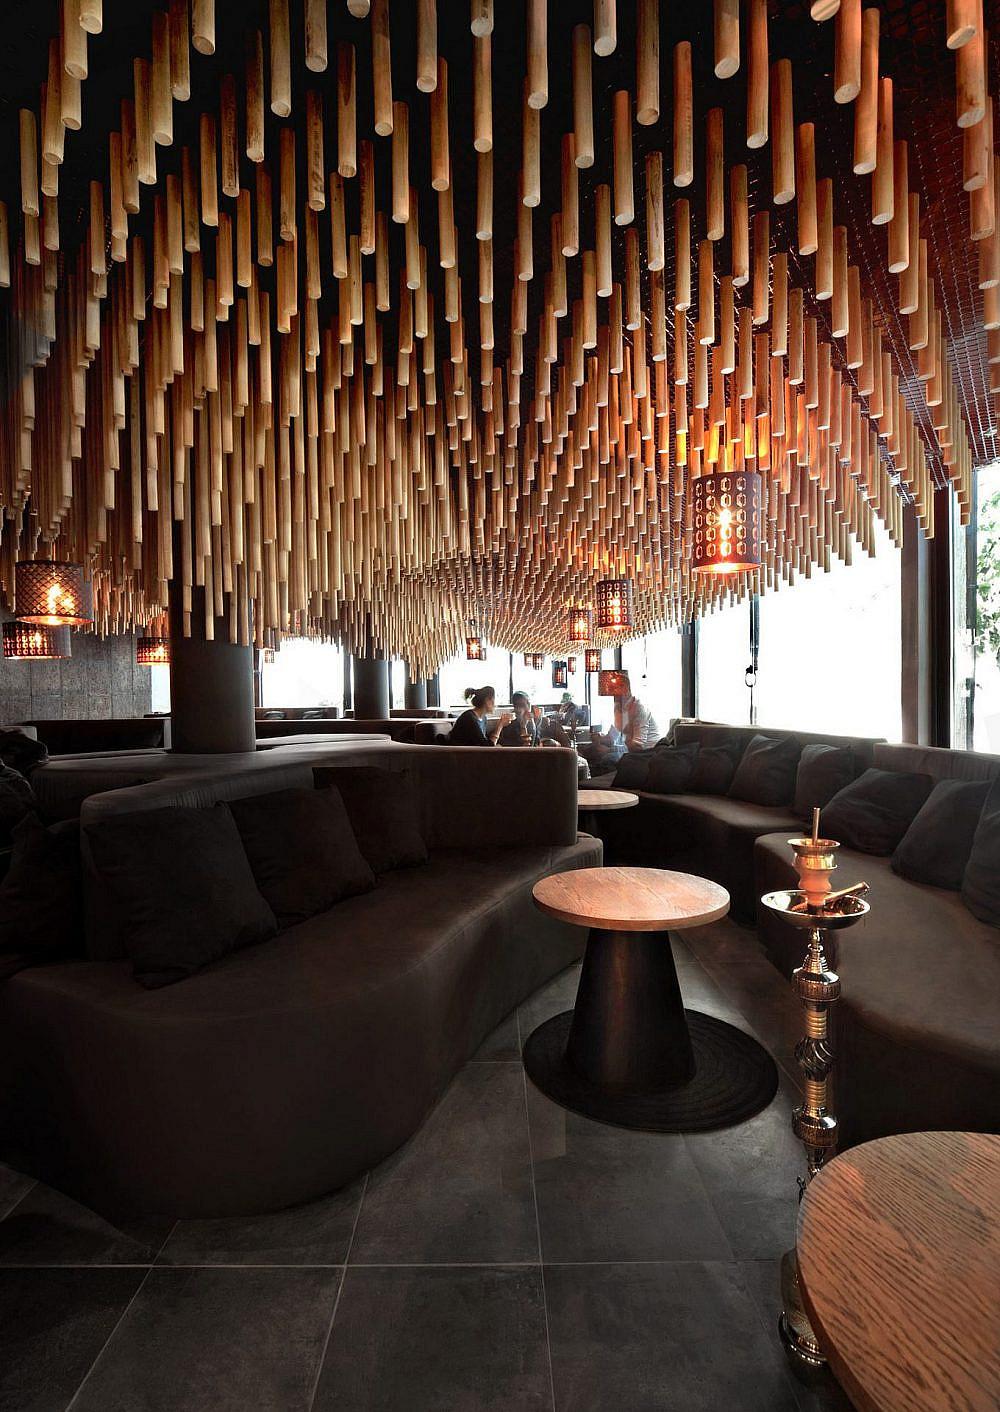 Nargile Bar   עיצוב: KMAN Studio   צילום: Tsvetomir Dzhermanov